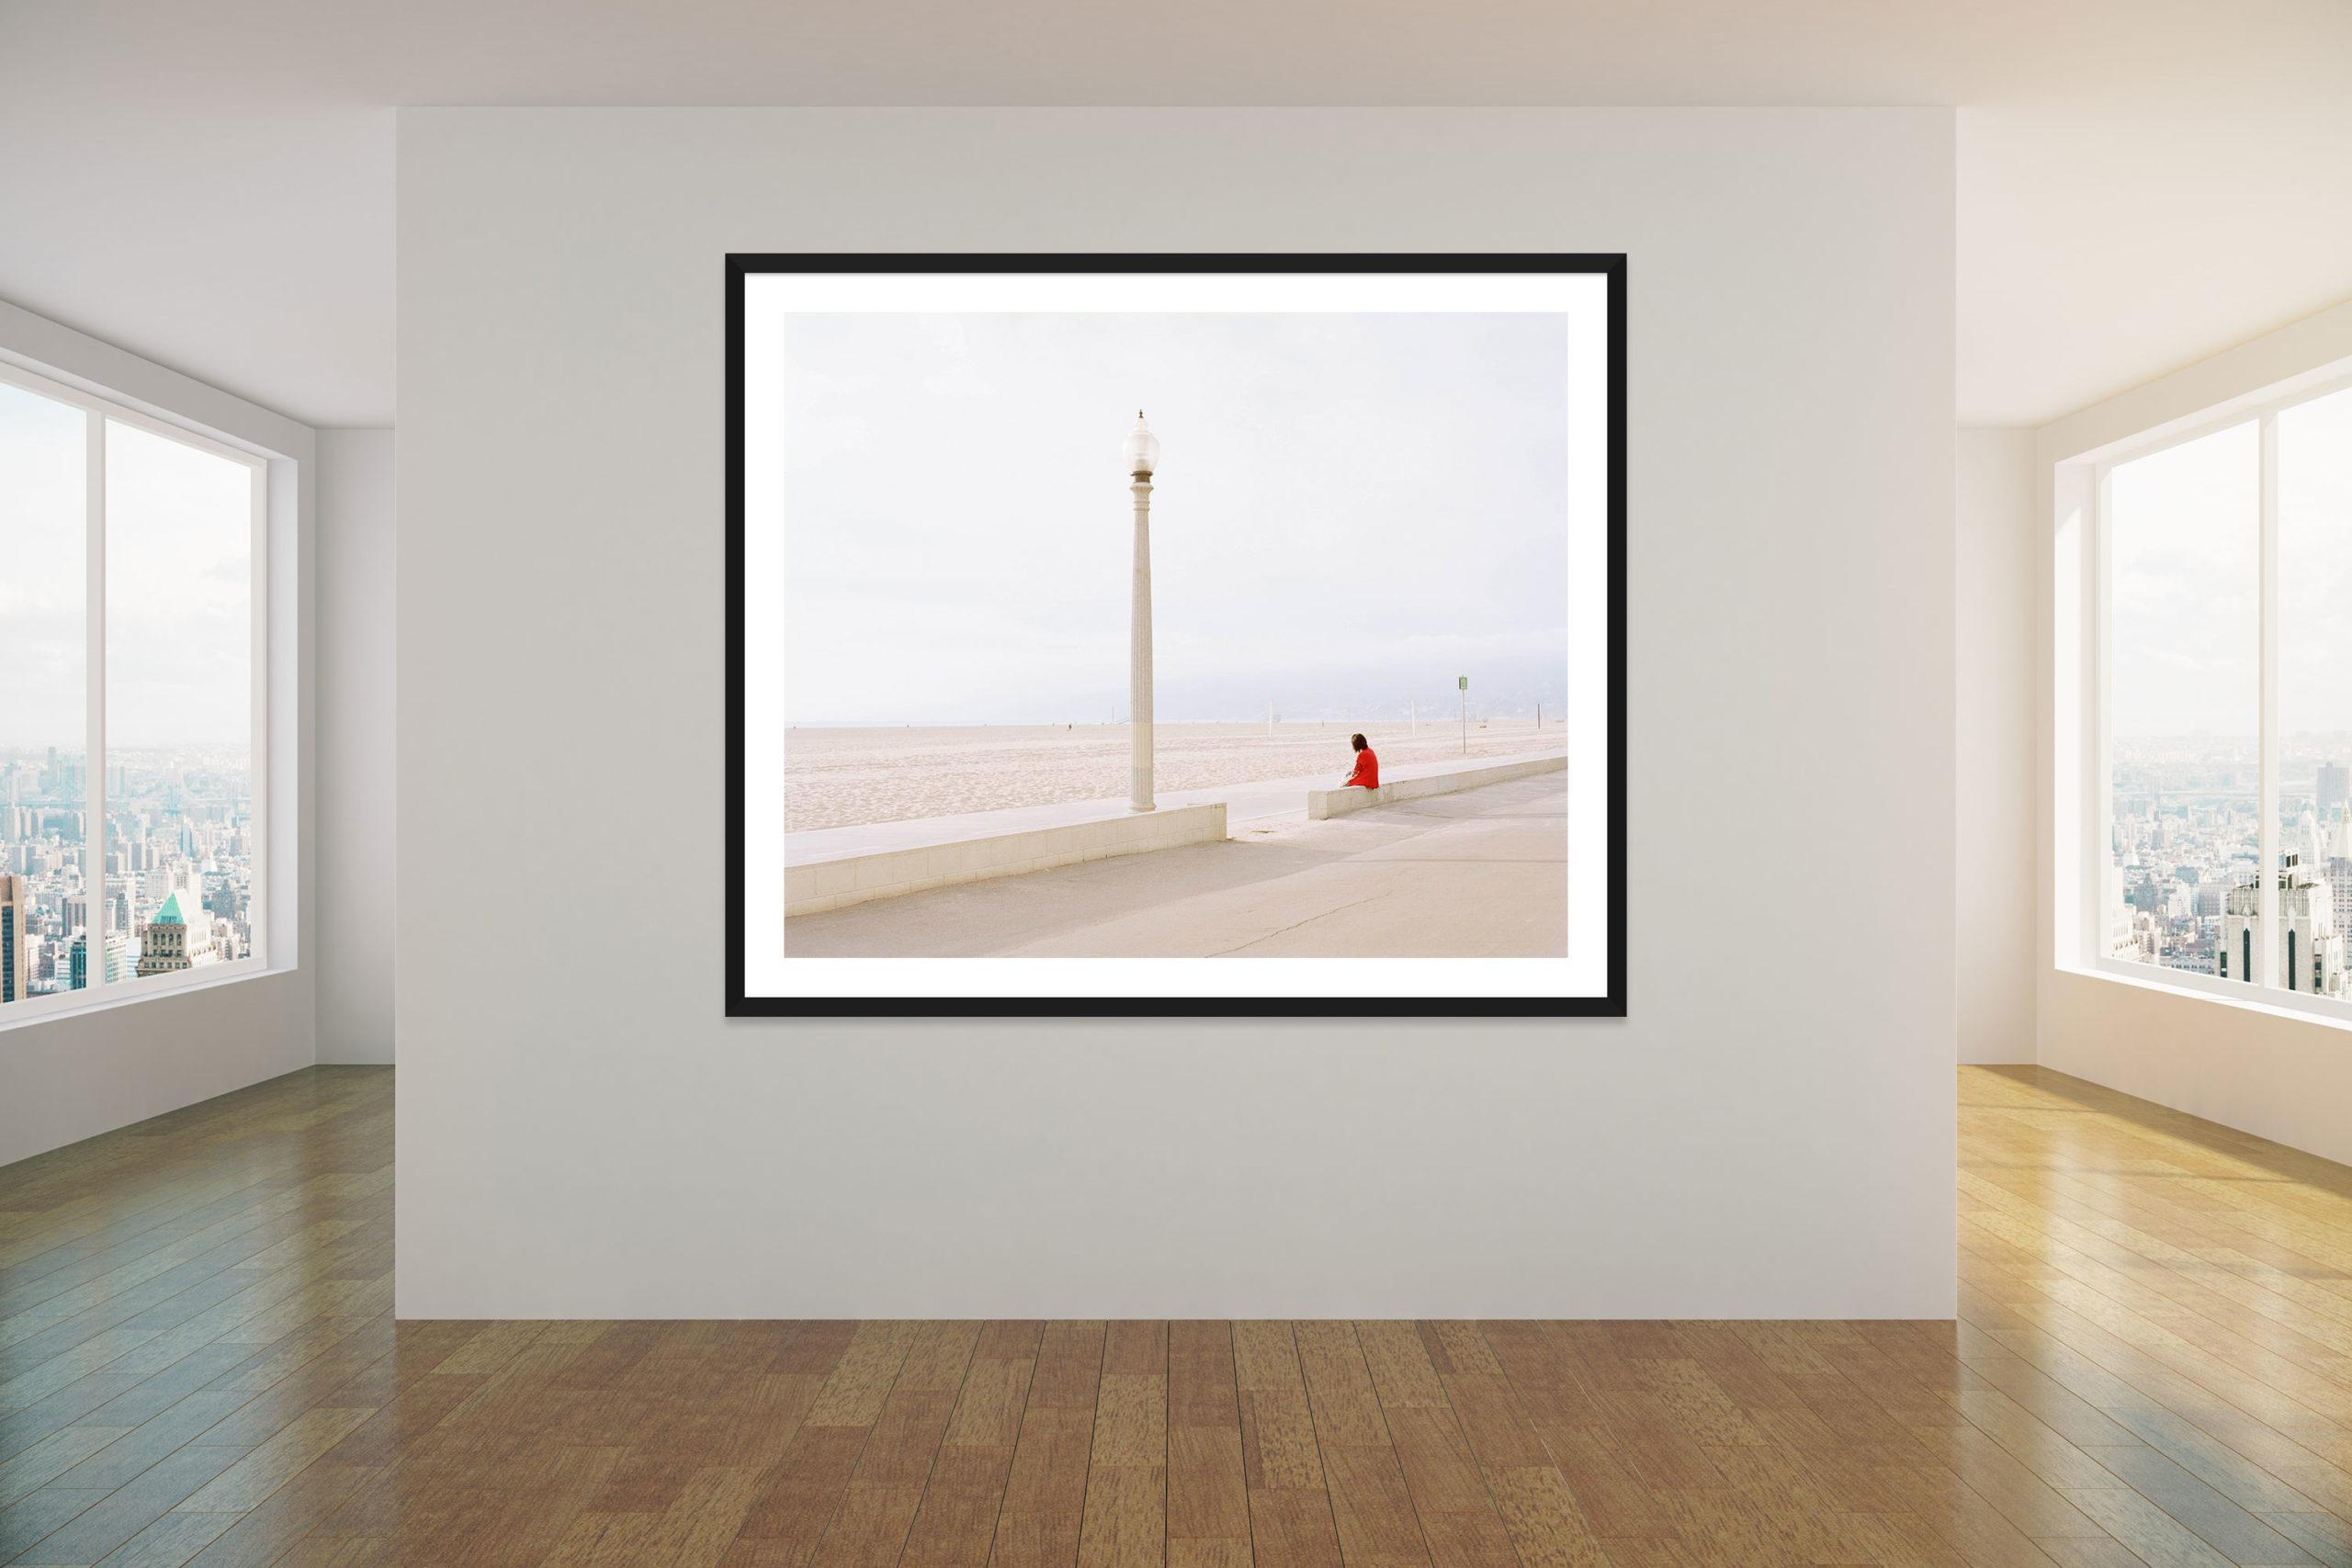 Tourist - Black Frame - Concrete Collection - Fine Art Photography by Toby Dixon